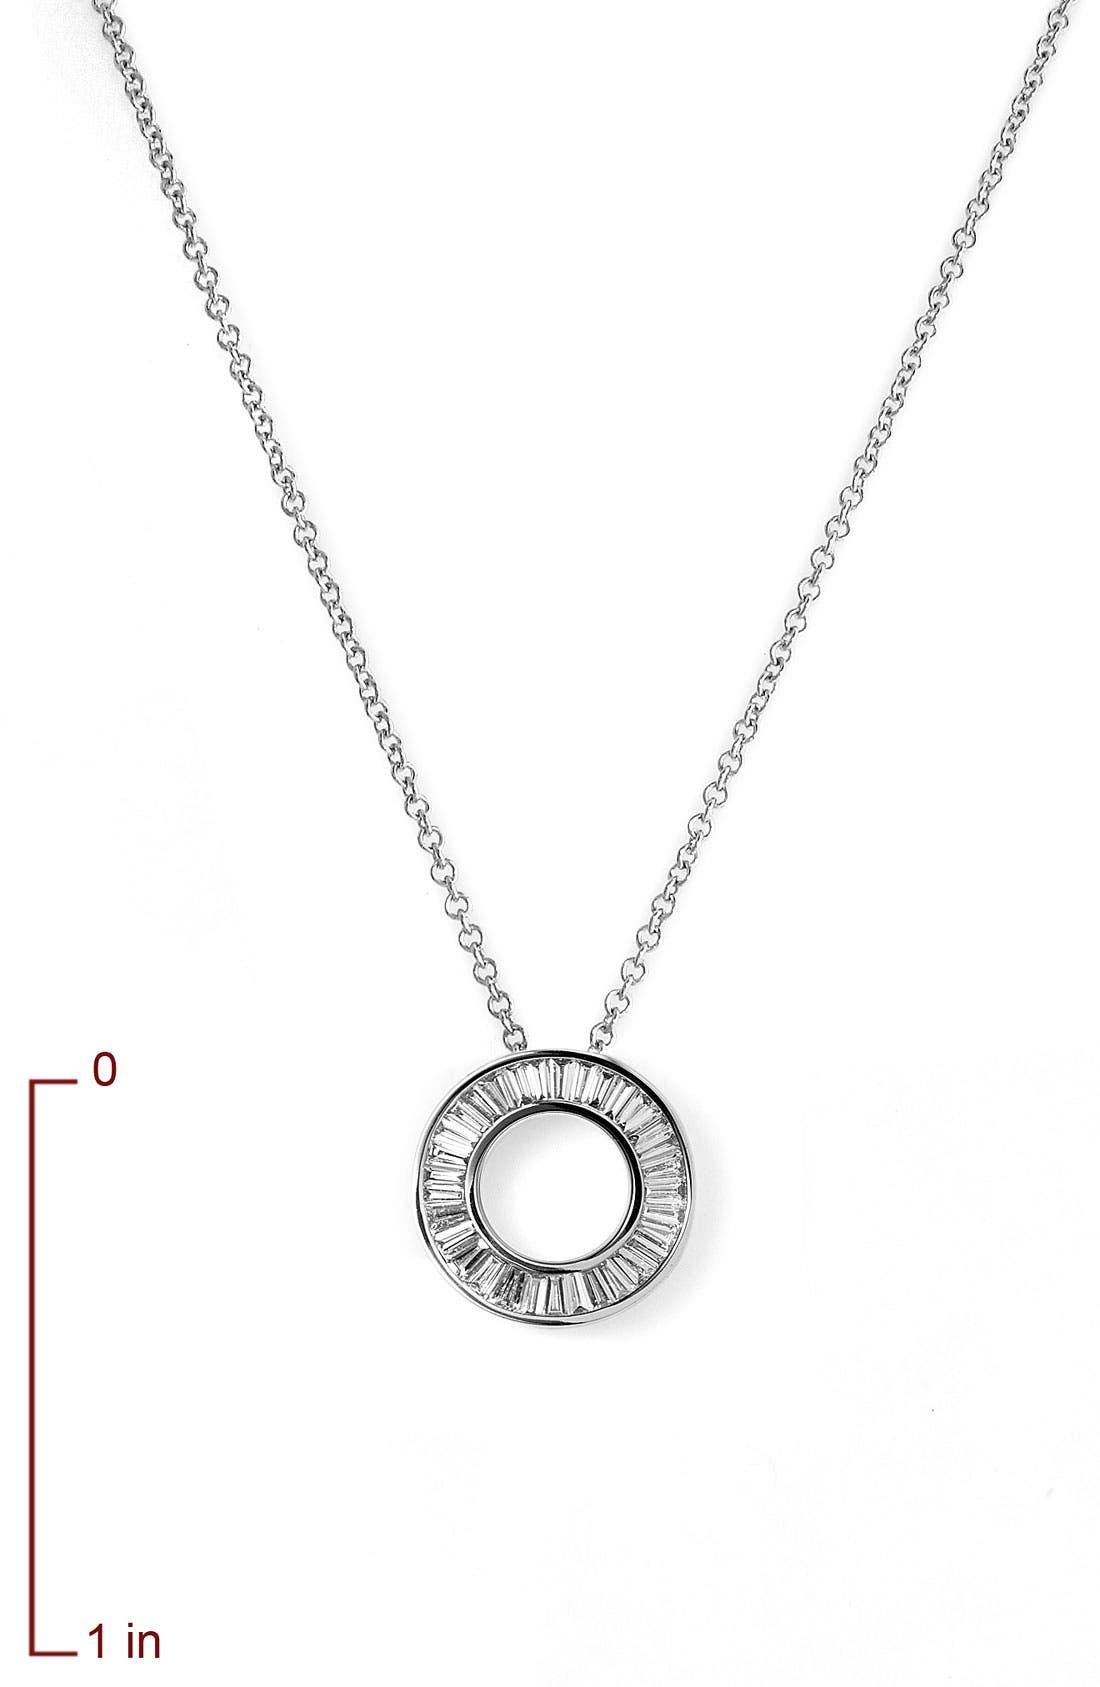 'Circle of Life' Small Diamond Pendant Necklace,                             Alternate thumbnail 6, color,                             WHITE GOLD